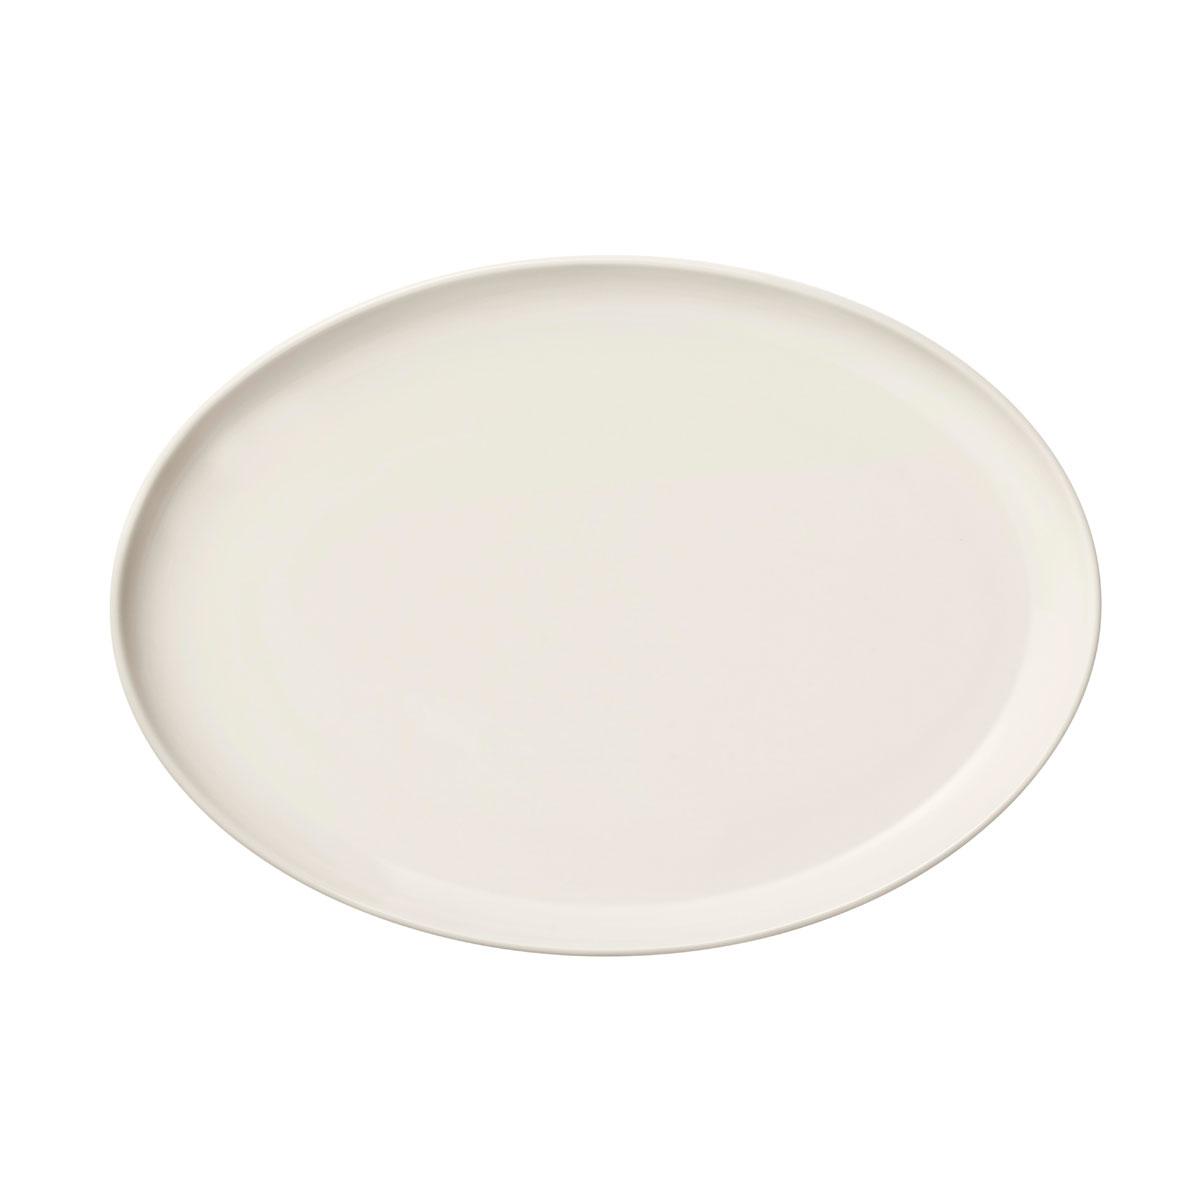 "Iittala Essence Plate 10"" Oval White"